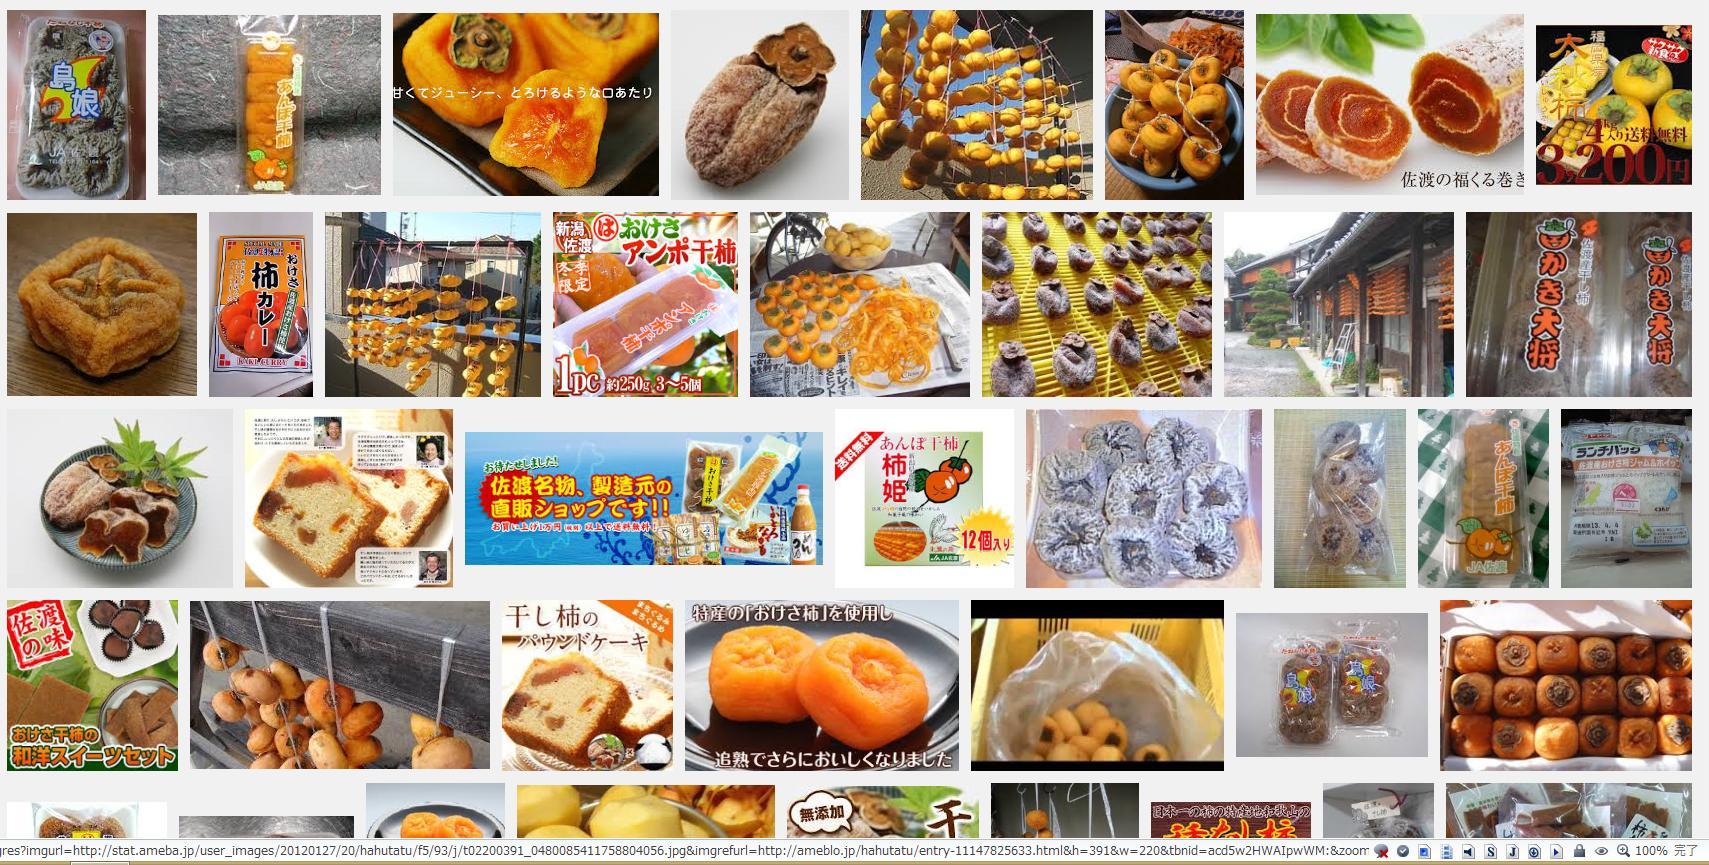 SnapCrab_NoName_2014-9-25_20-7-0_No-00.png